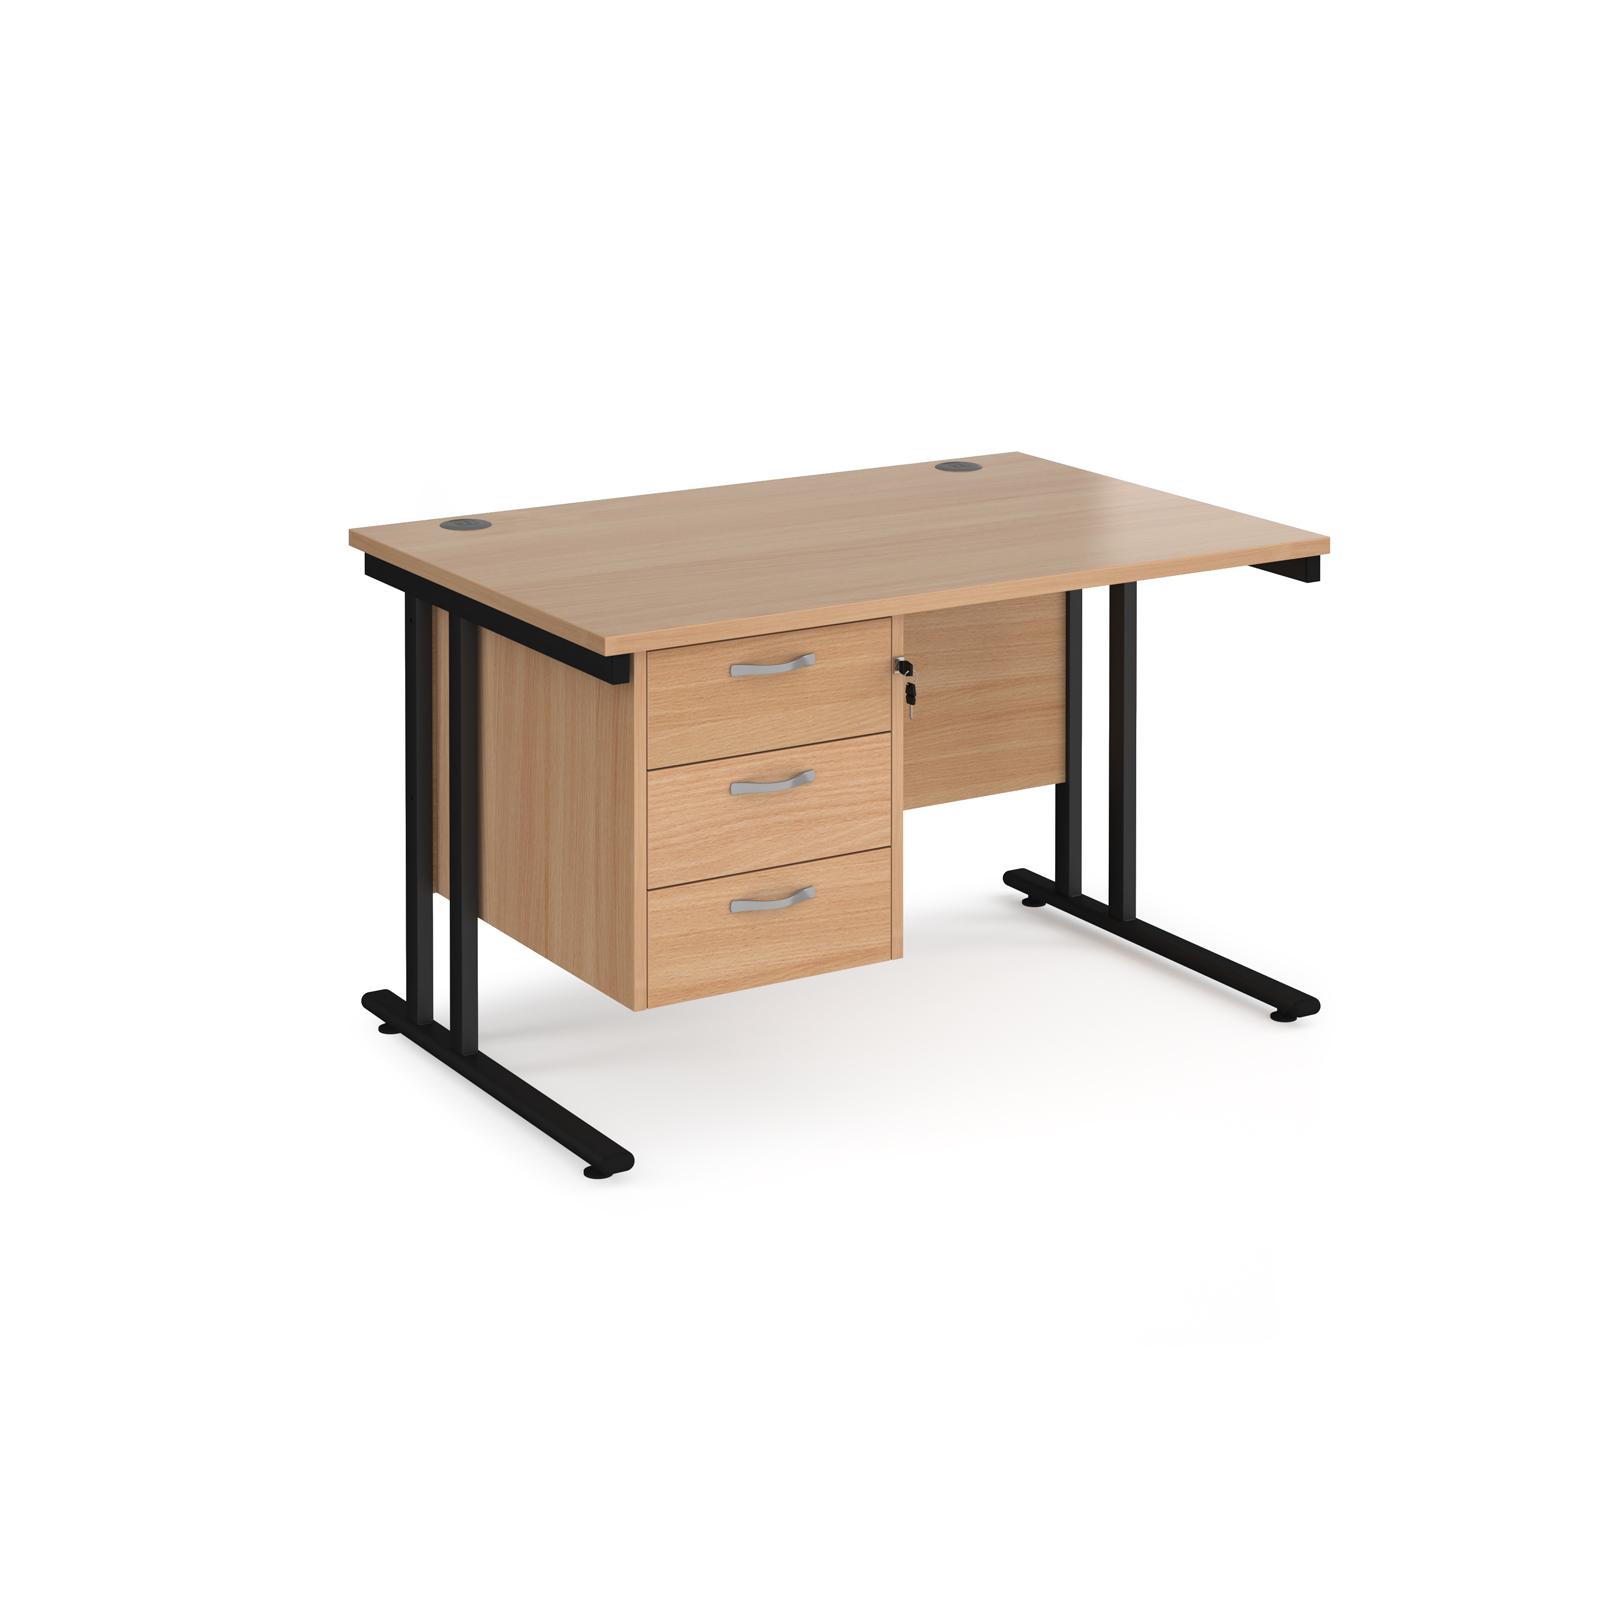 Rectangular Desks Maestro 25 straight desk 1200mm x 800mm with 3 drawer pedestal - black cantilever leg frame, beech top